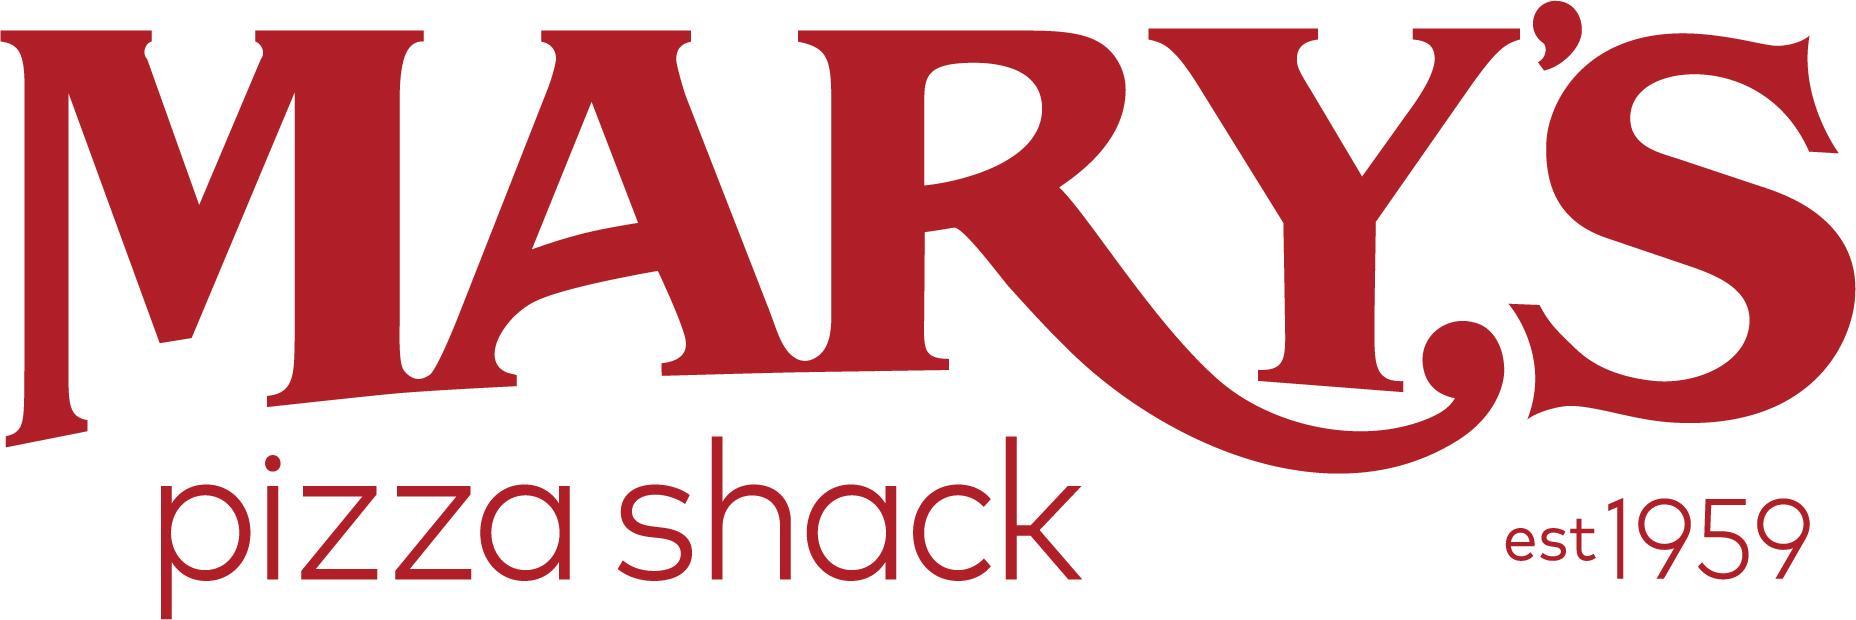 marys_pizza_shack_logo_FINAL.jpg.jpeg